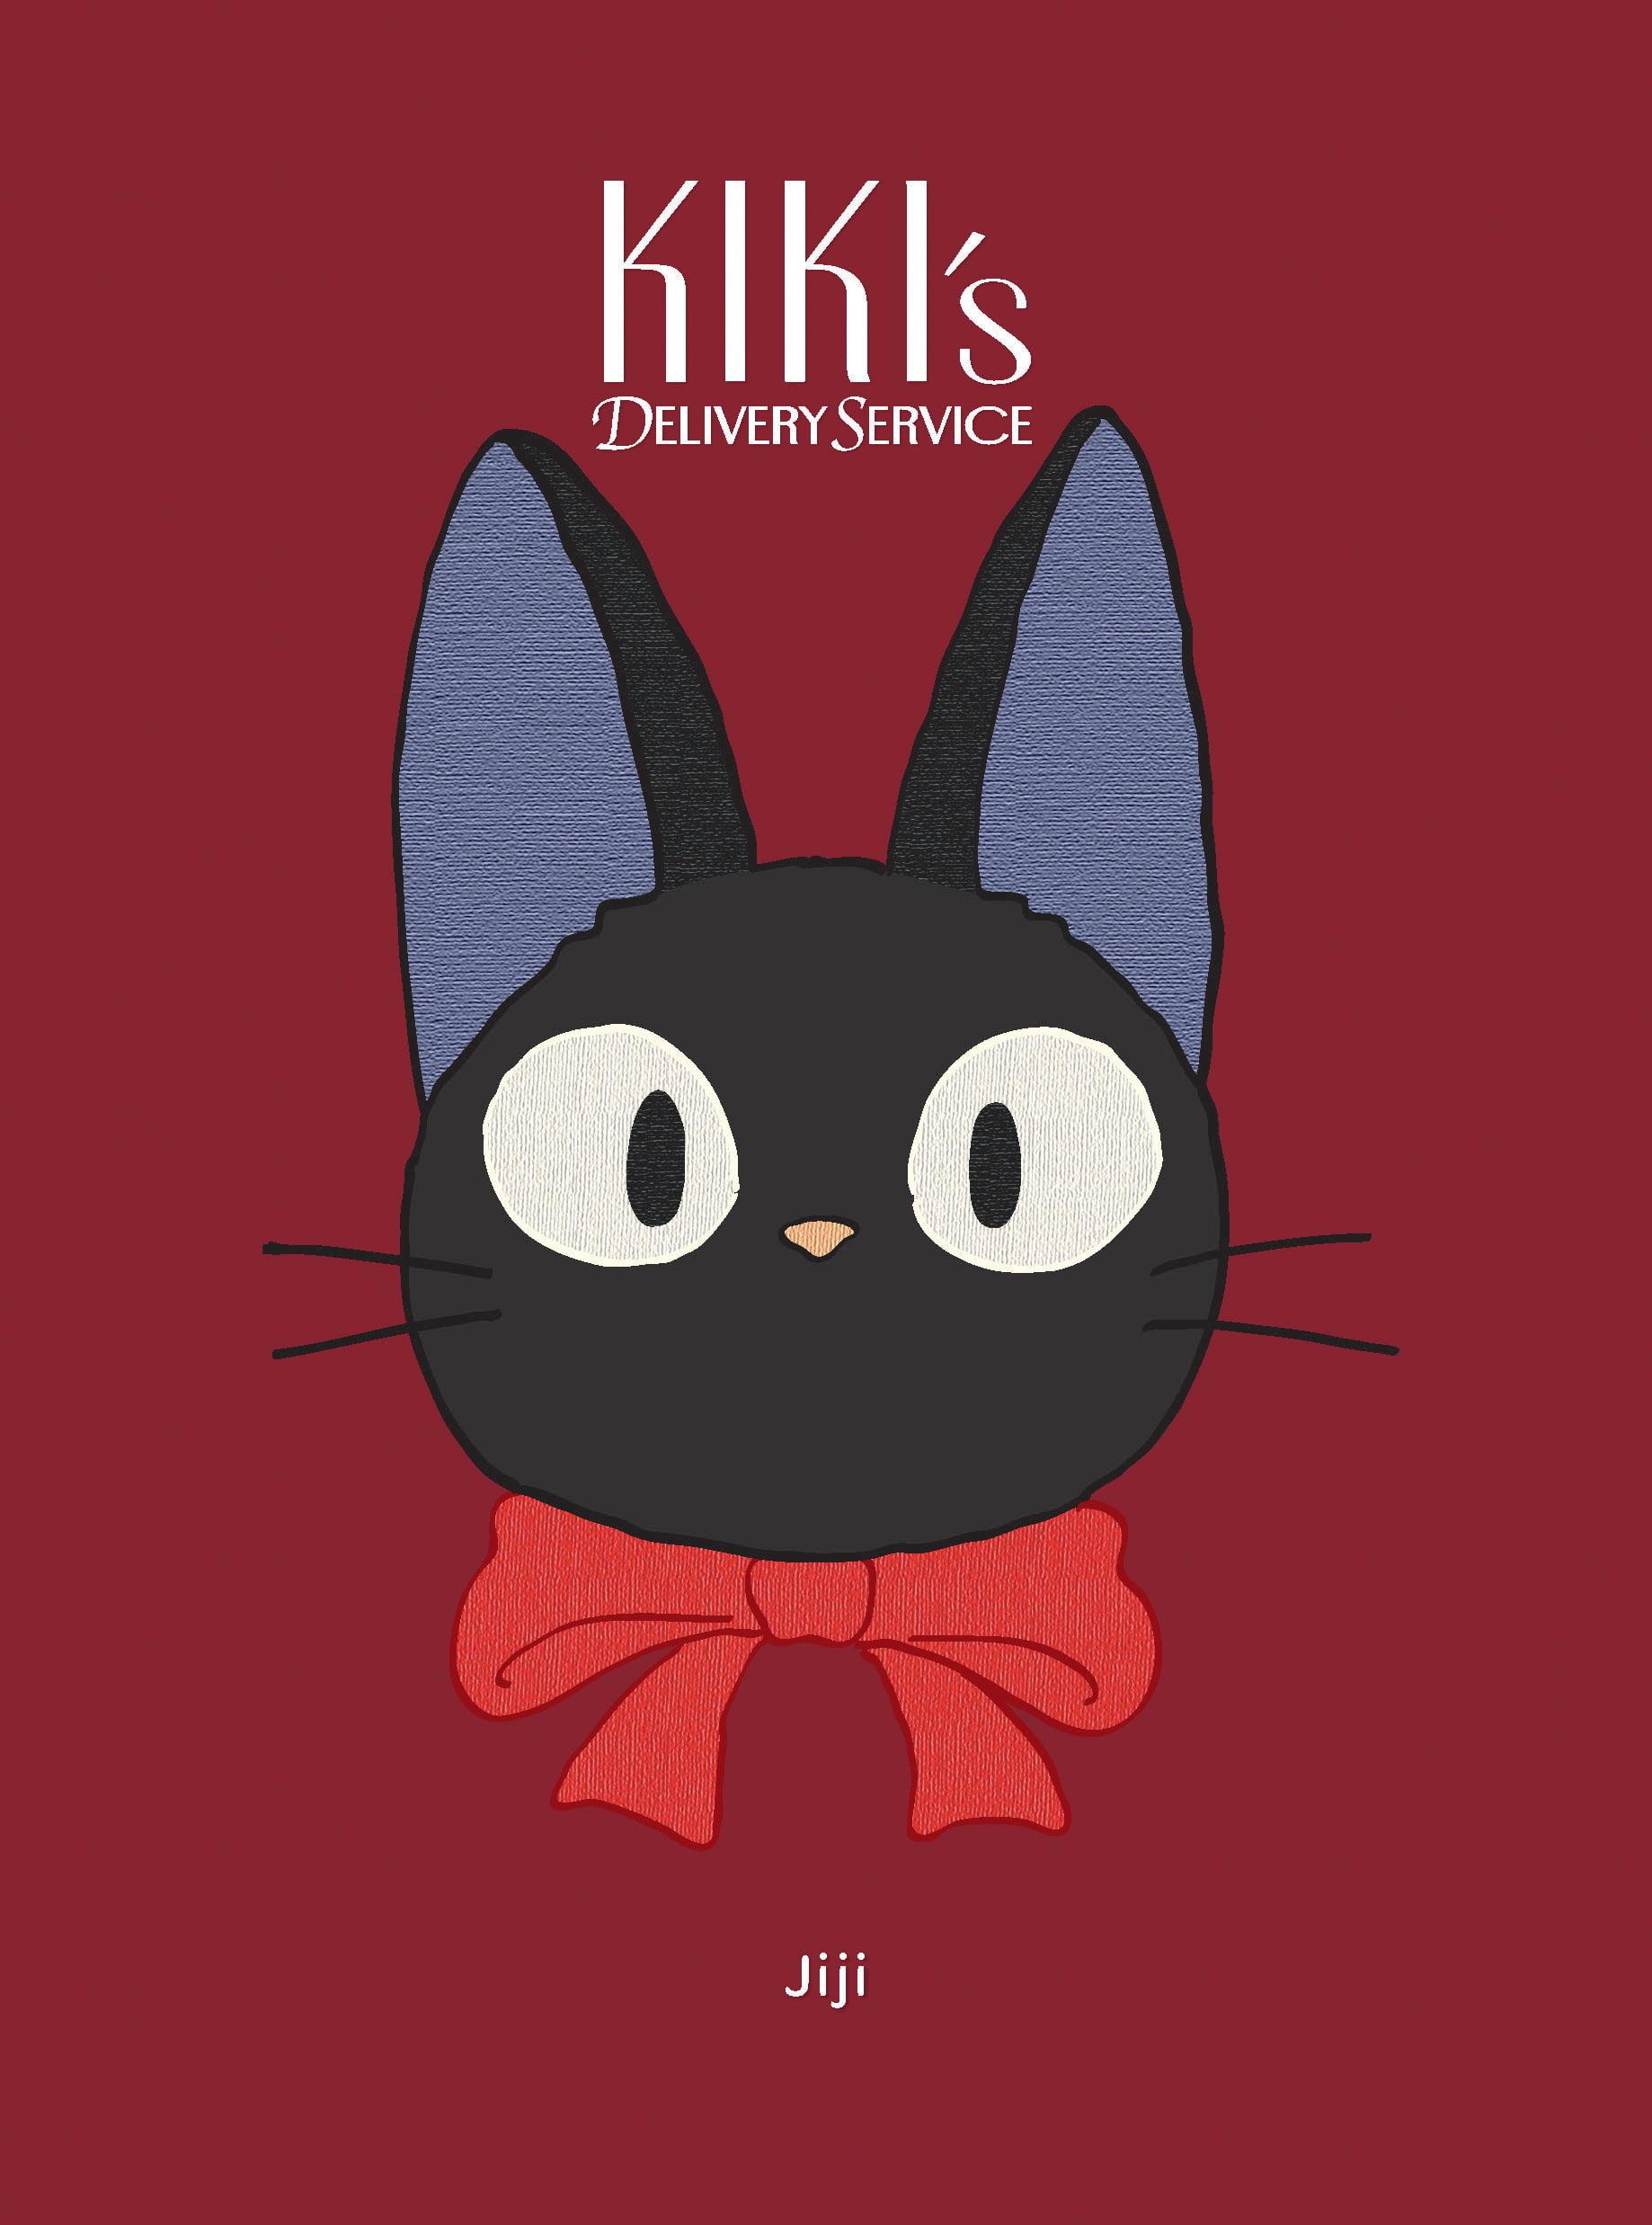 Kiki S Delivery Service Jiji Plush Journal Textured Journal Japanese Anime Journal Cat Journal Walmart Com Walmart Com